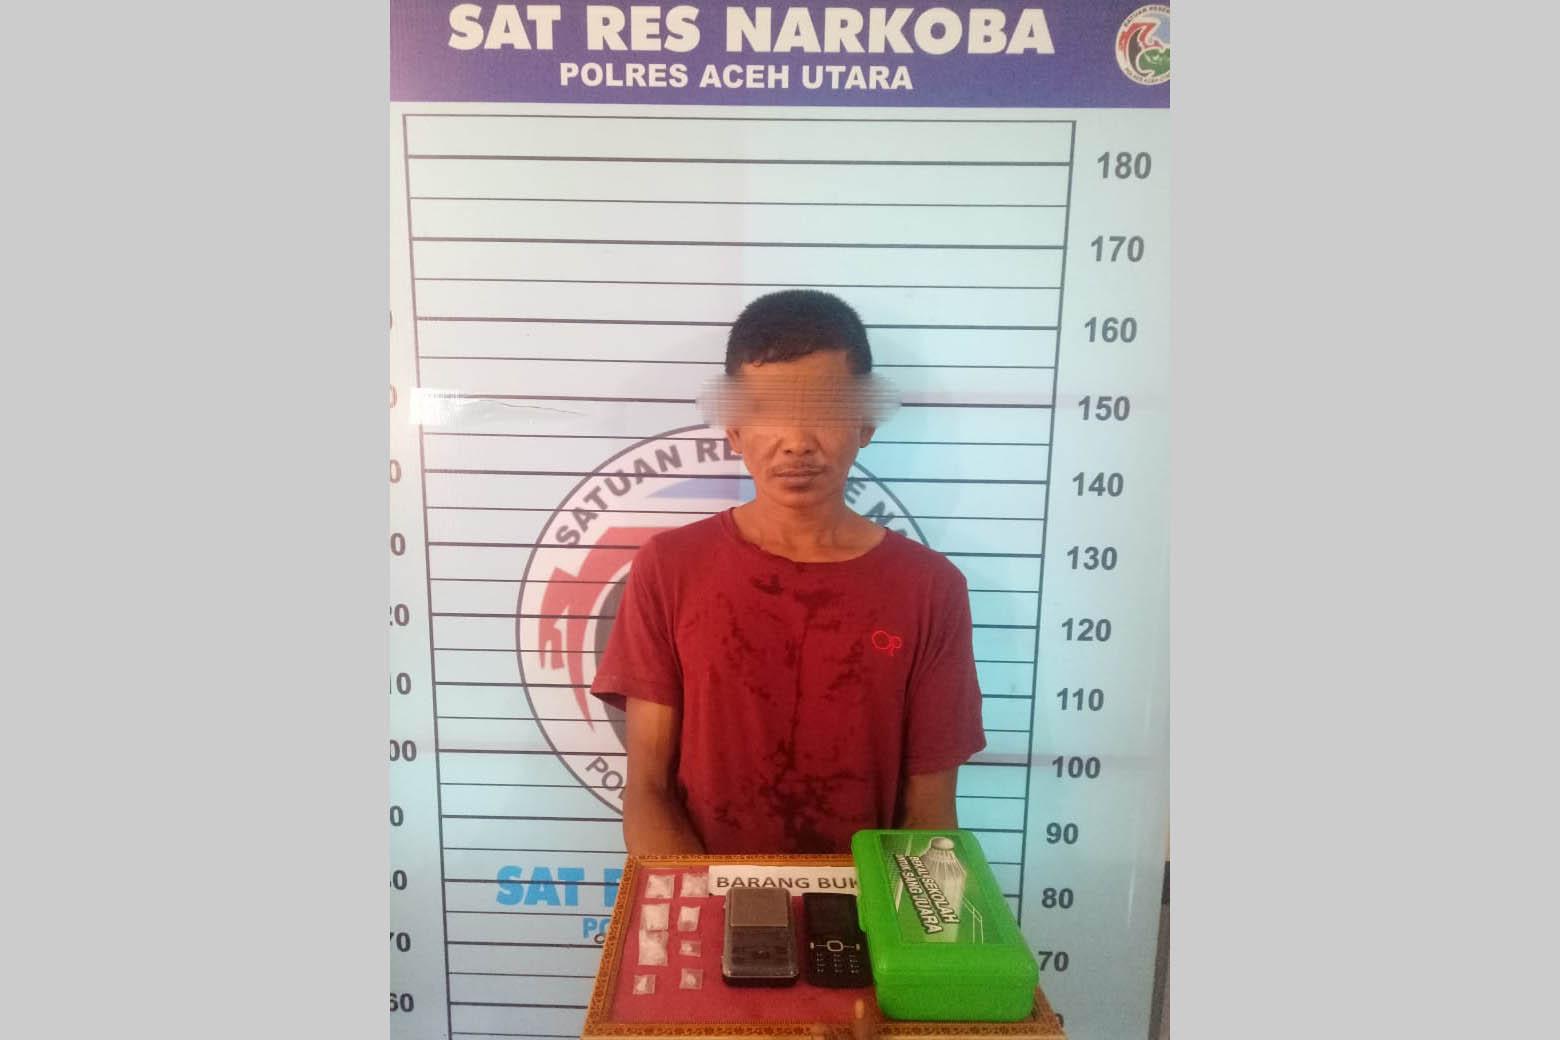 Polisi Tangkap Penjual Narkoba di Paya Bakong, 8 Paket Sabu Diamankan